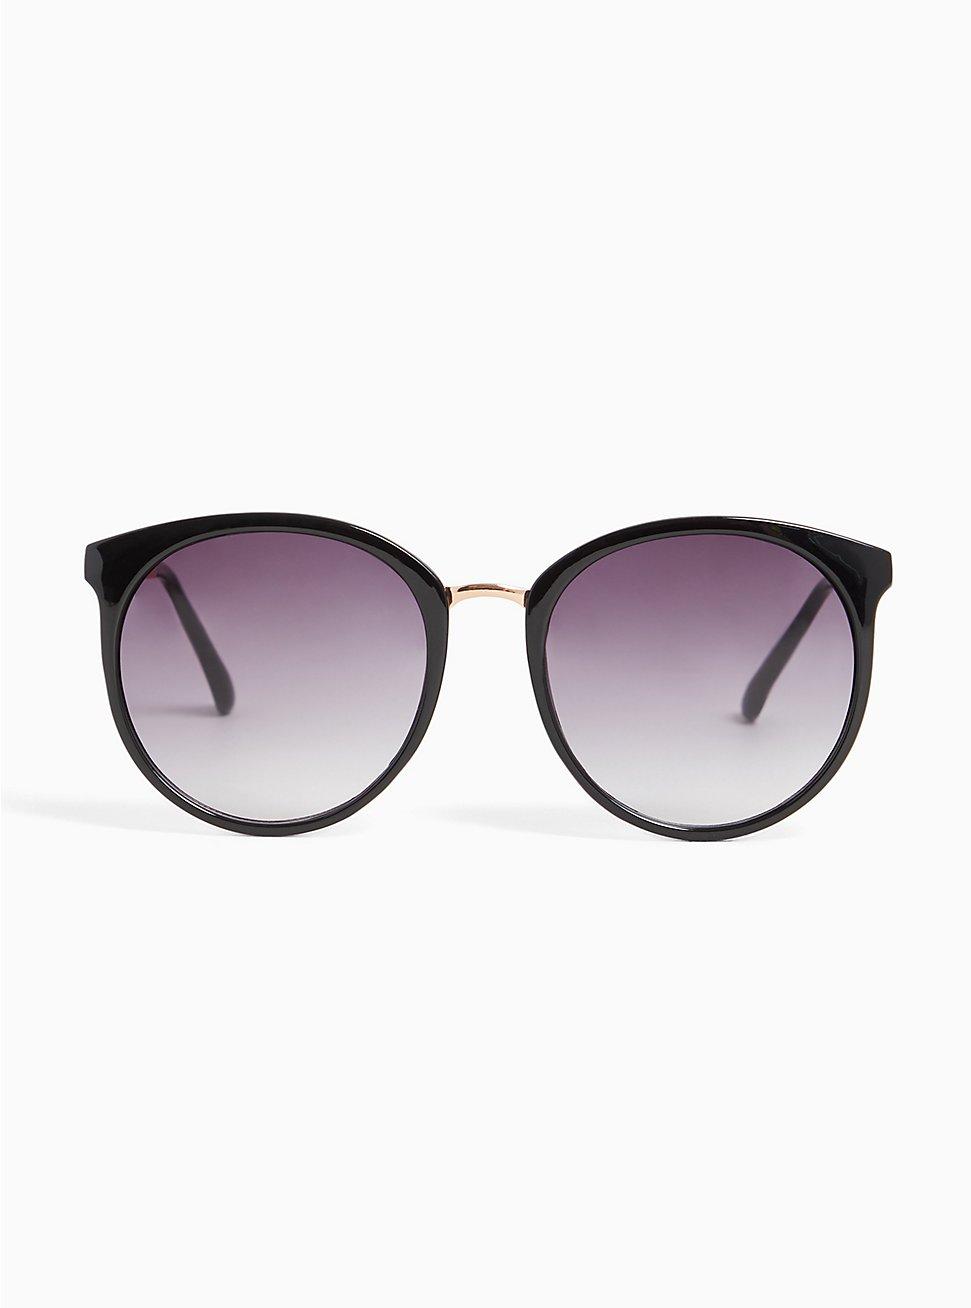 Black Rounded Cat Eye Sunglasses, , hi-res